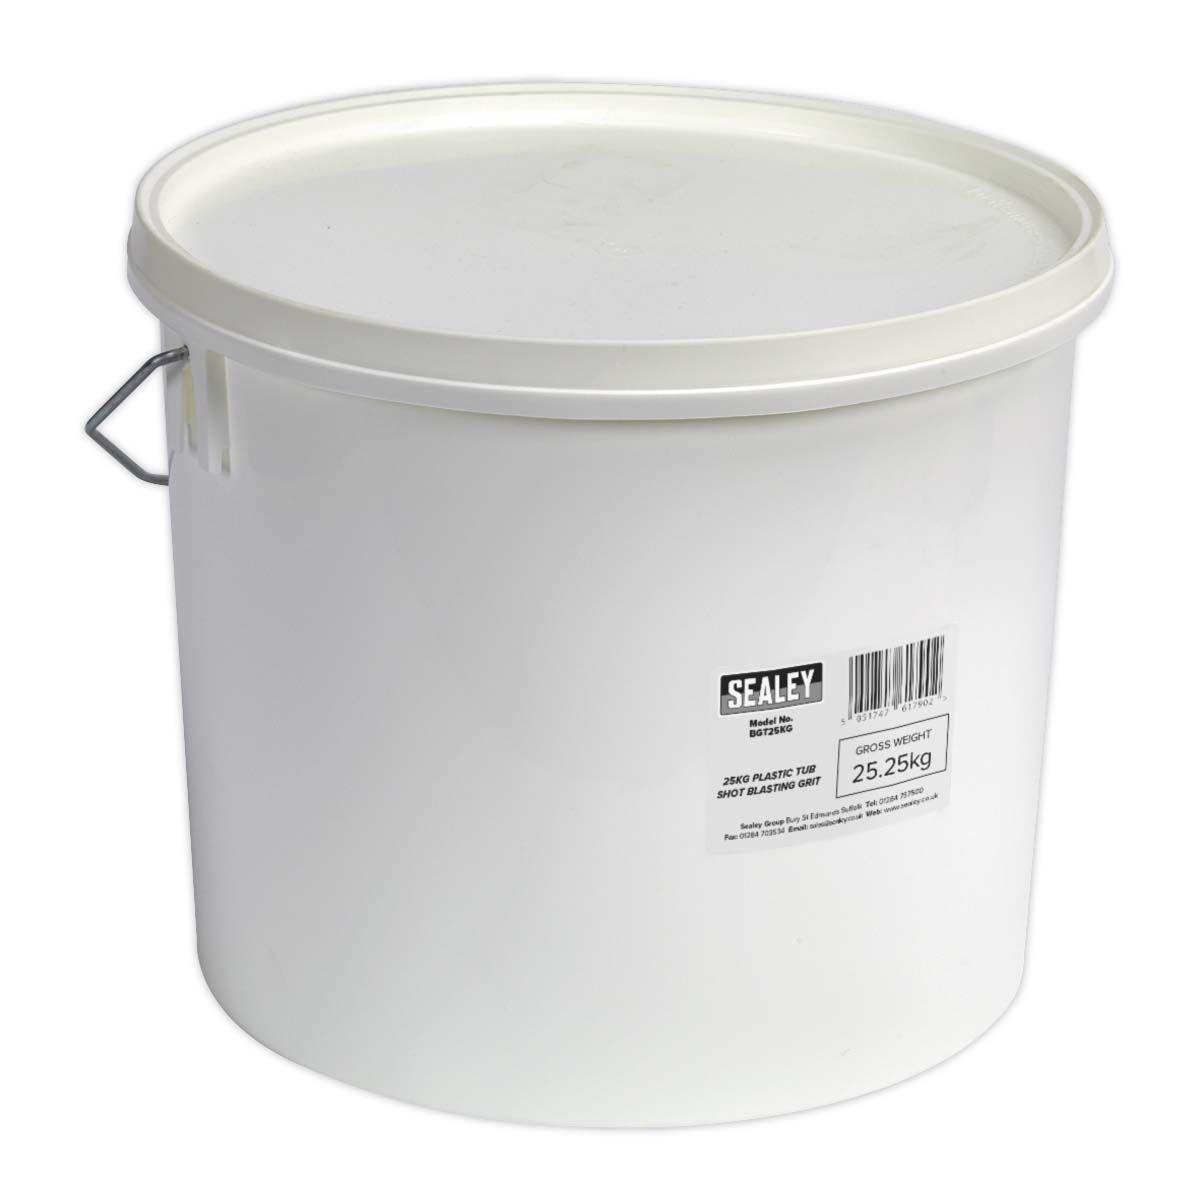 Sealey Shot Blasting Grit 25kg Plastic Tub